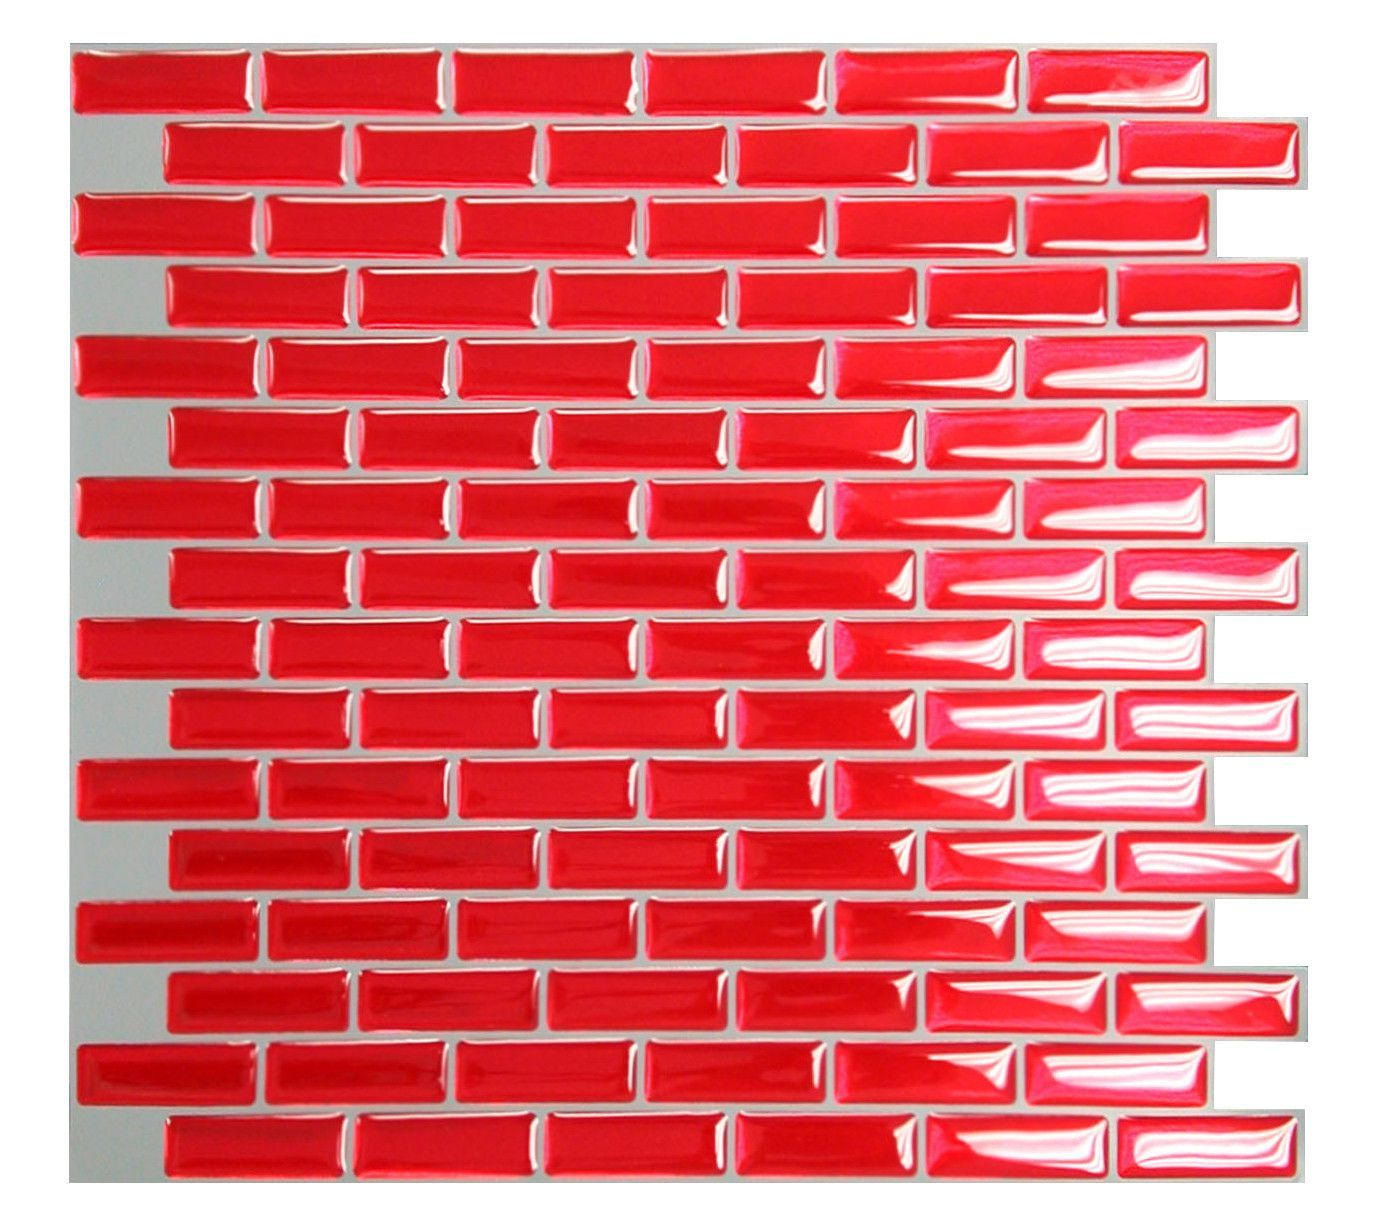 mosaik 9 1 x 10 2 resin peel stick mosaic tile in red rh pinterest com